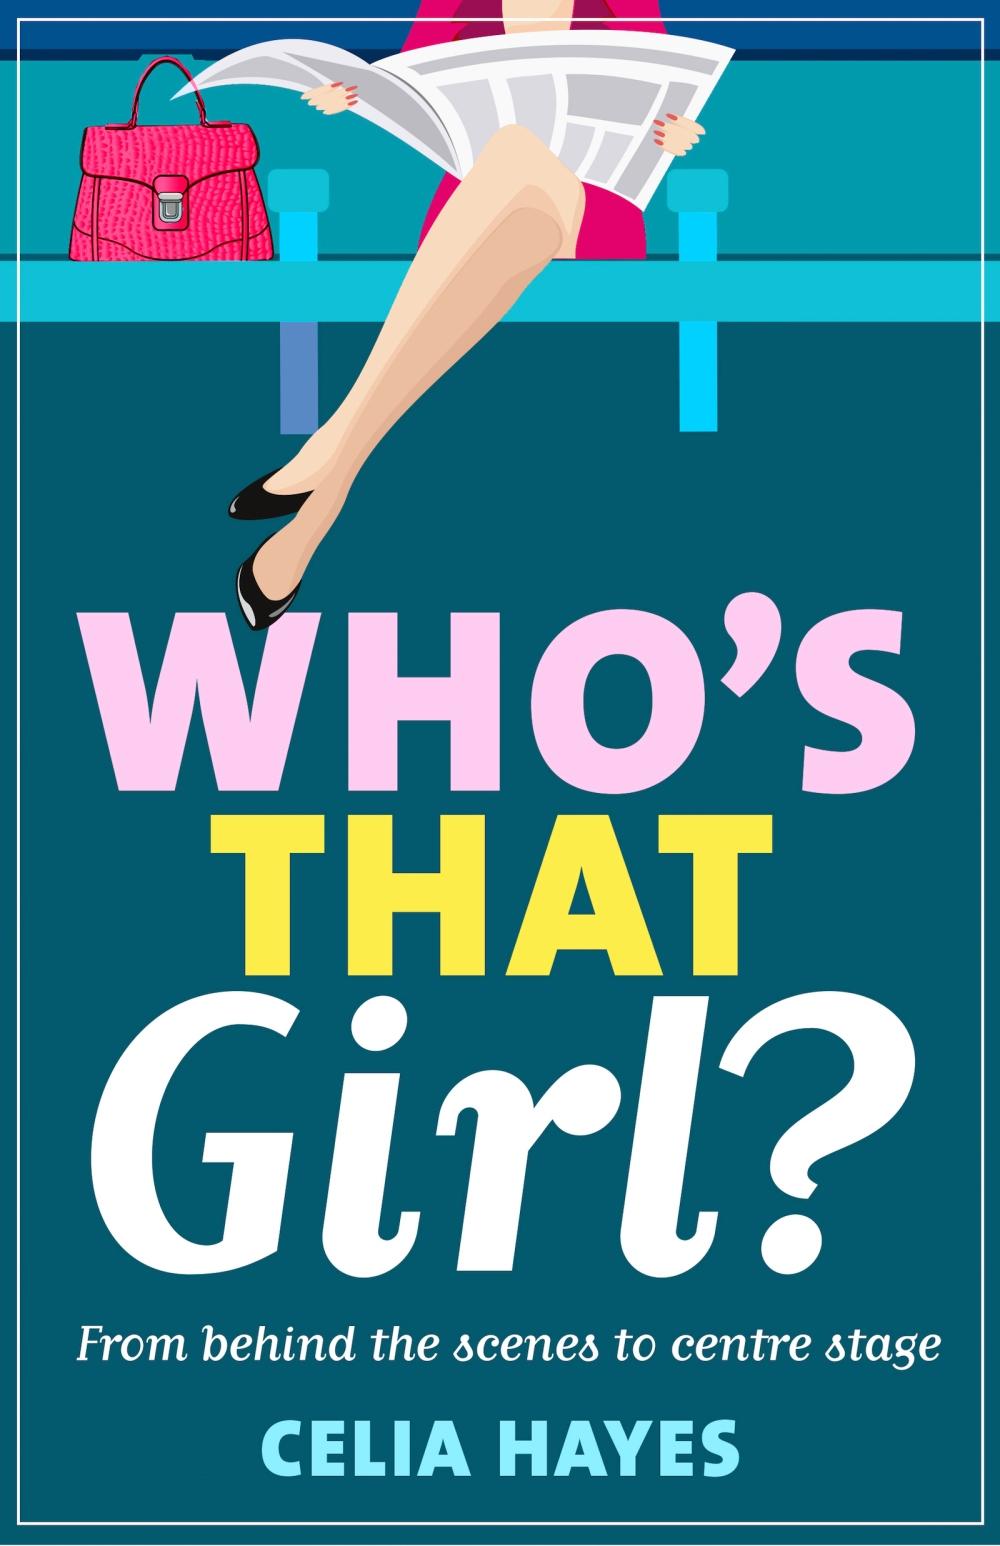 WHOS THAT GIRL COVER.jpg